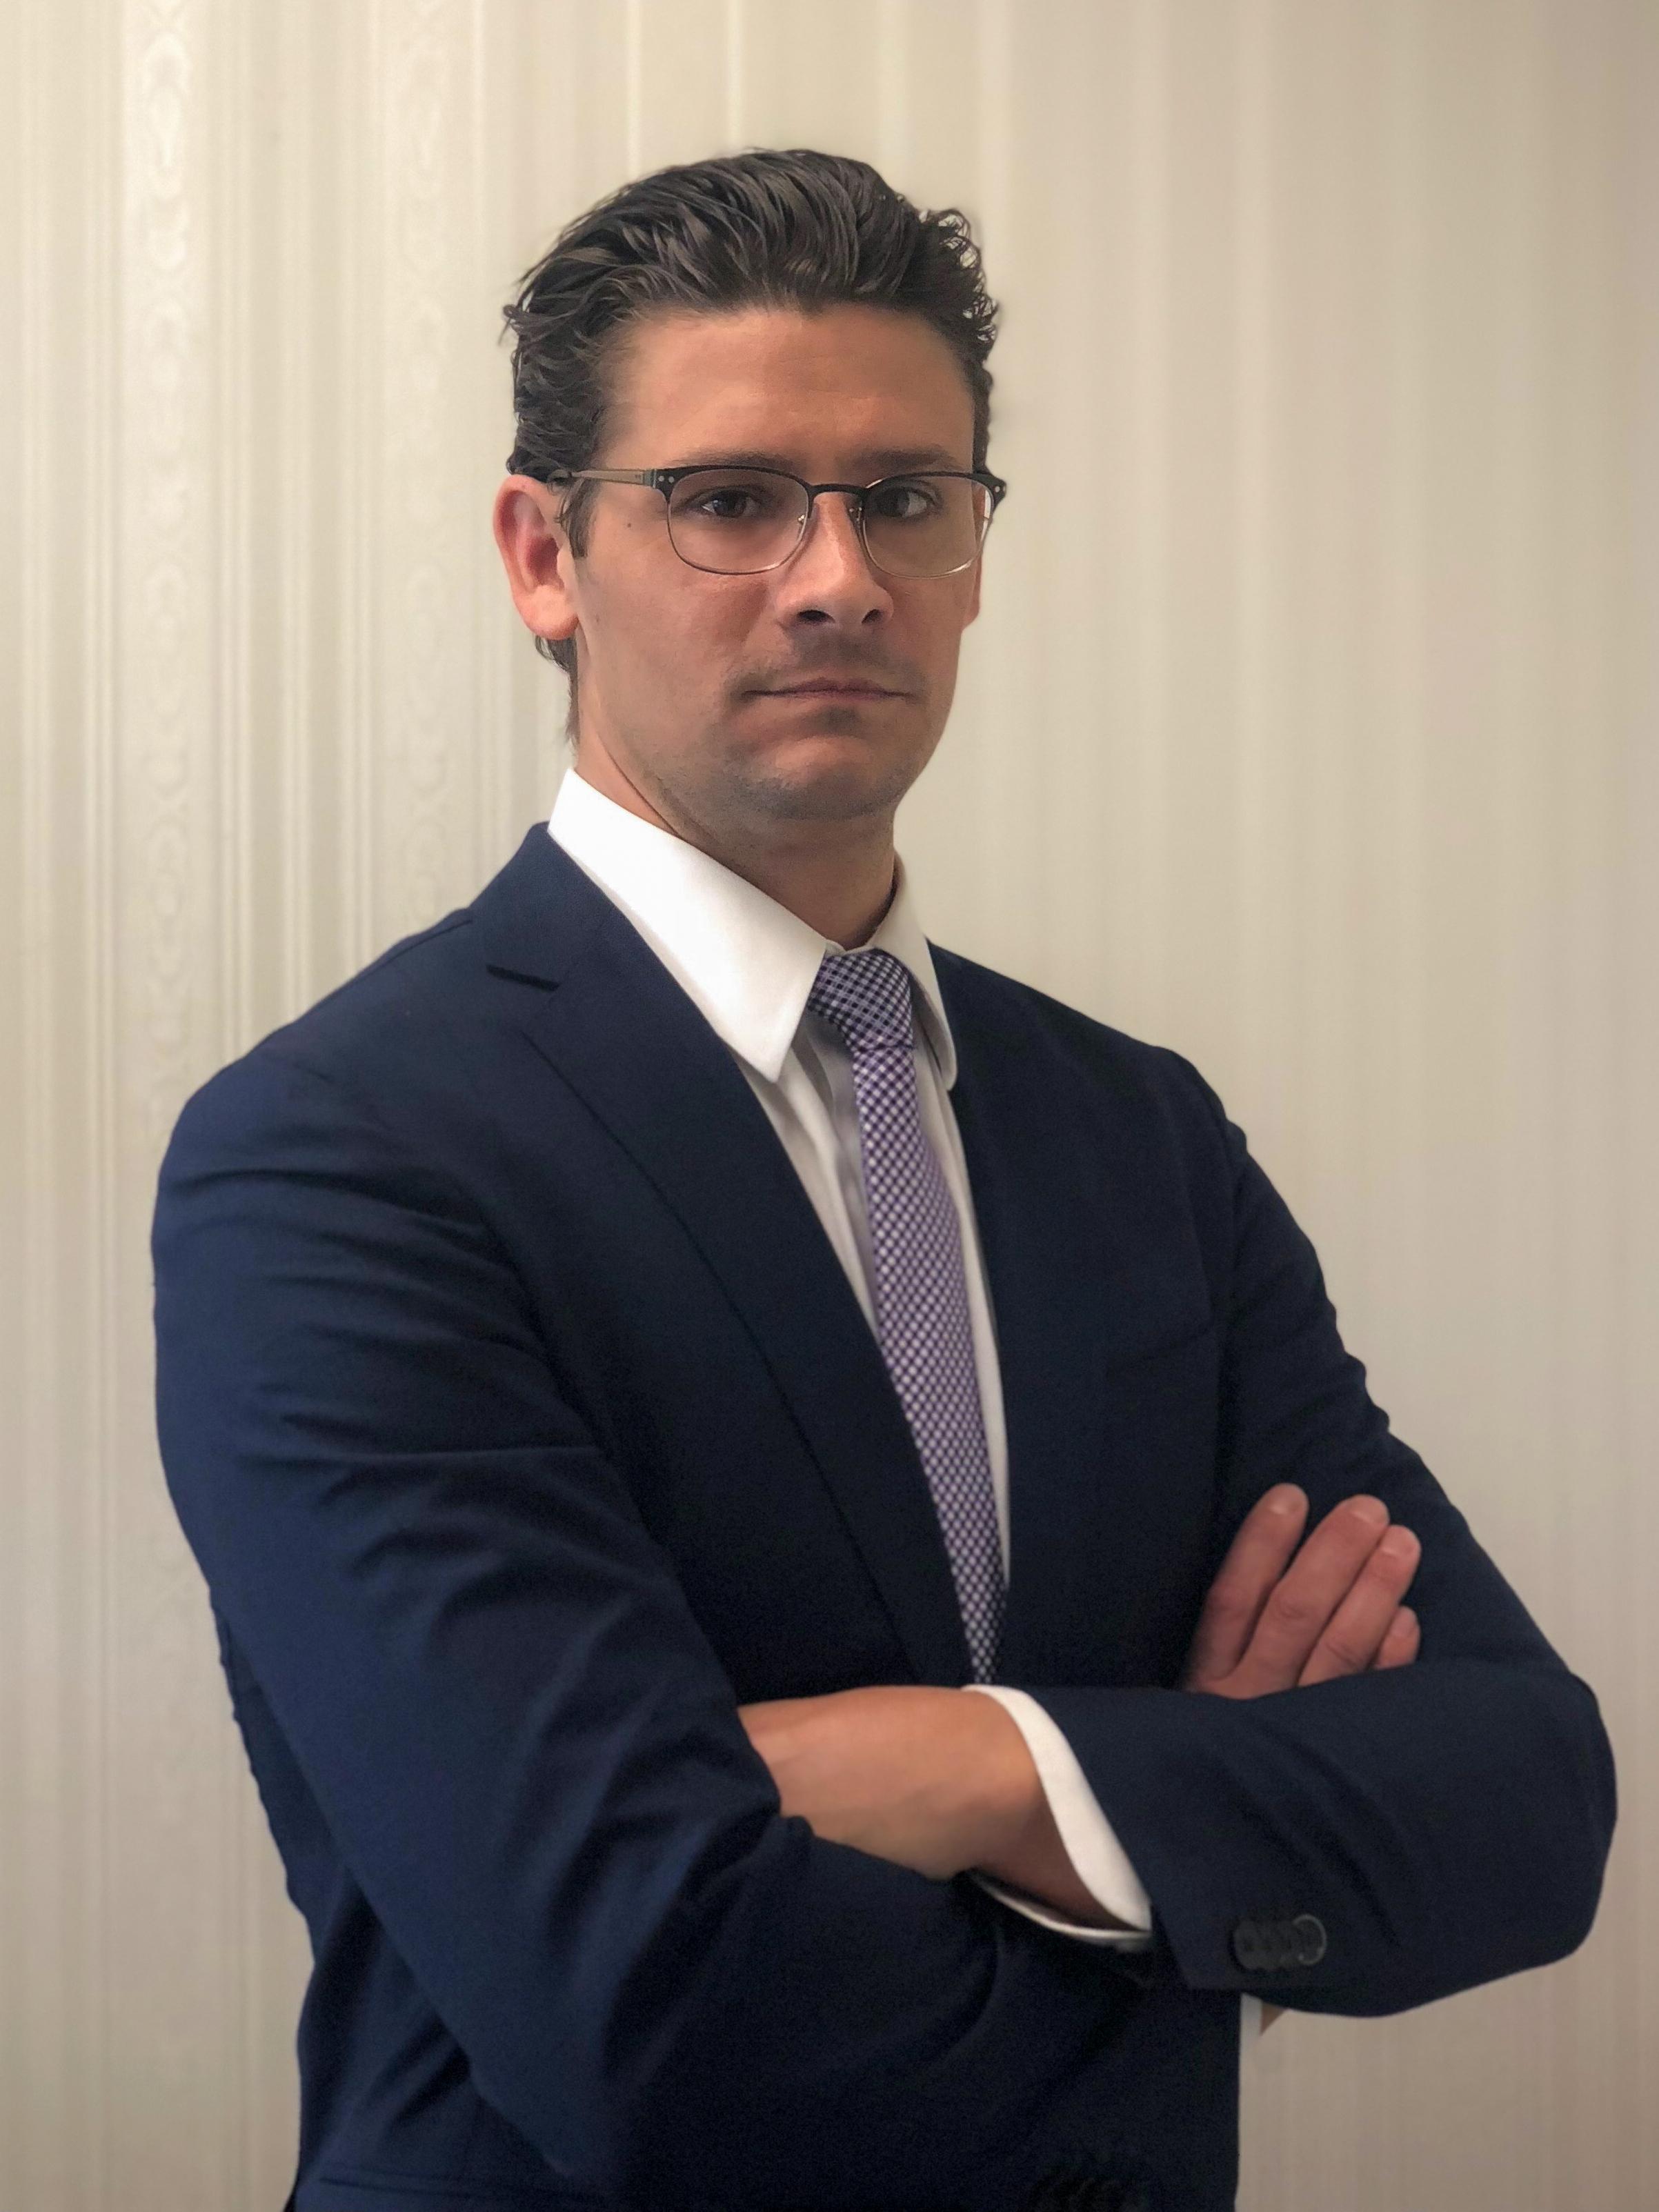 Media Pa Medical Malpractice Attorney